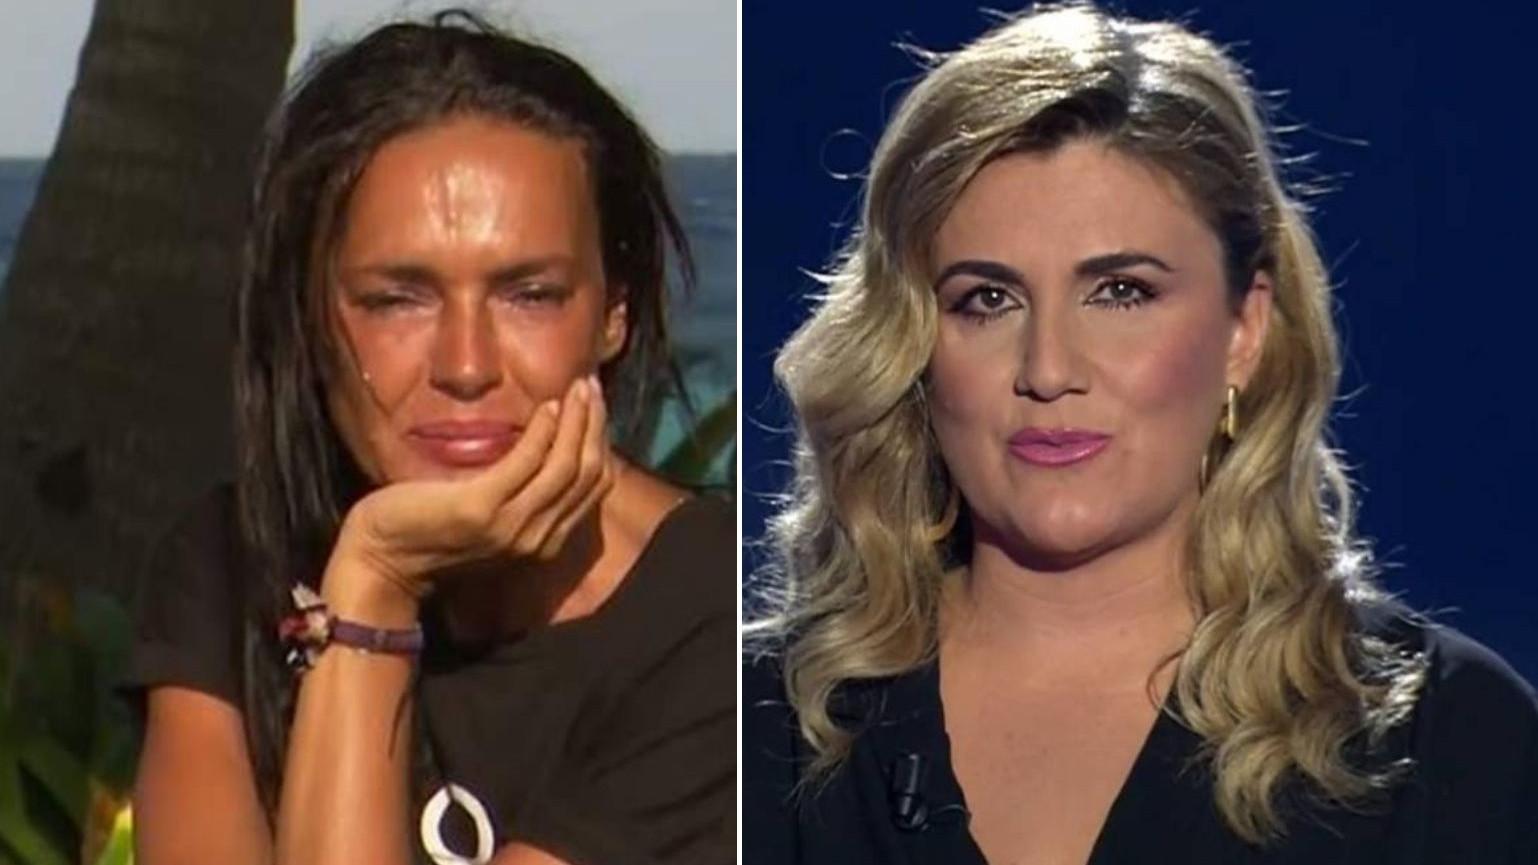 La hermana de Olga Moreno amenaza a Carlota Corredera